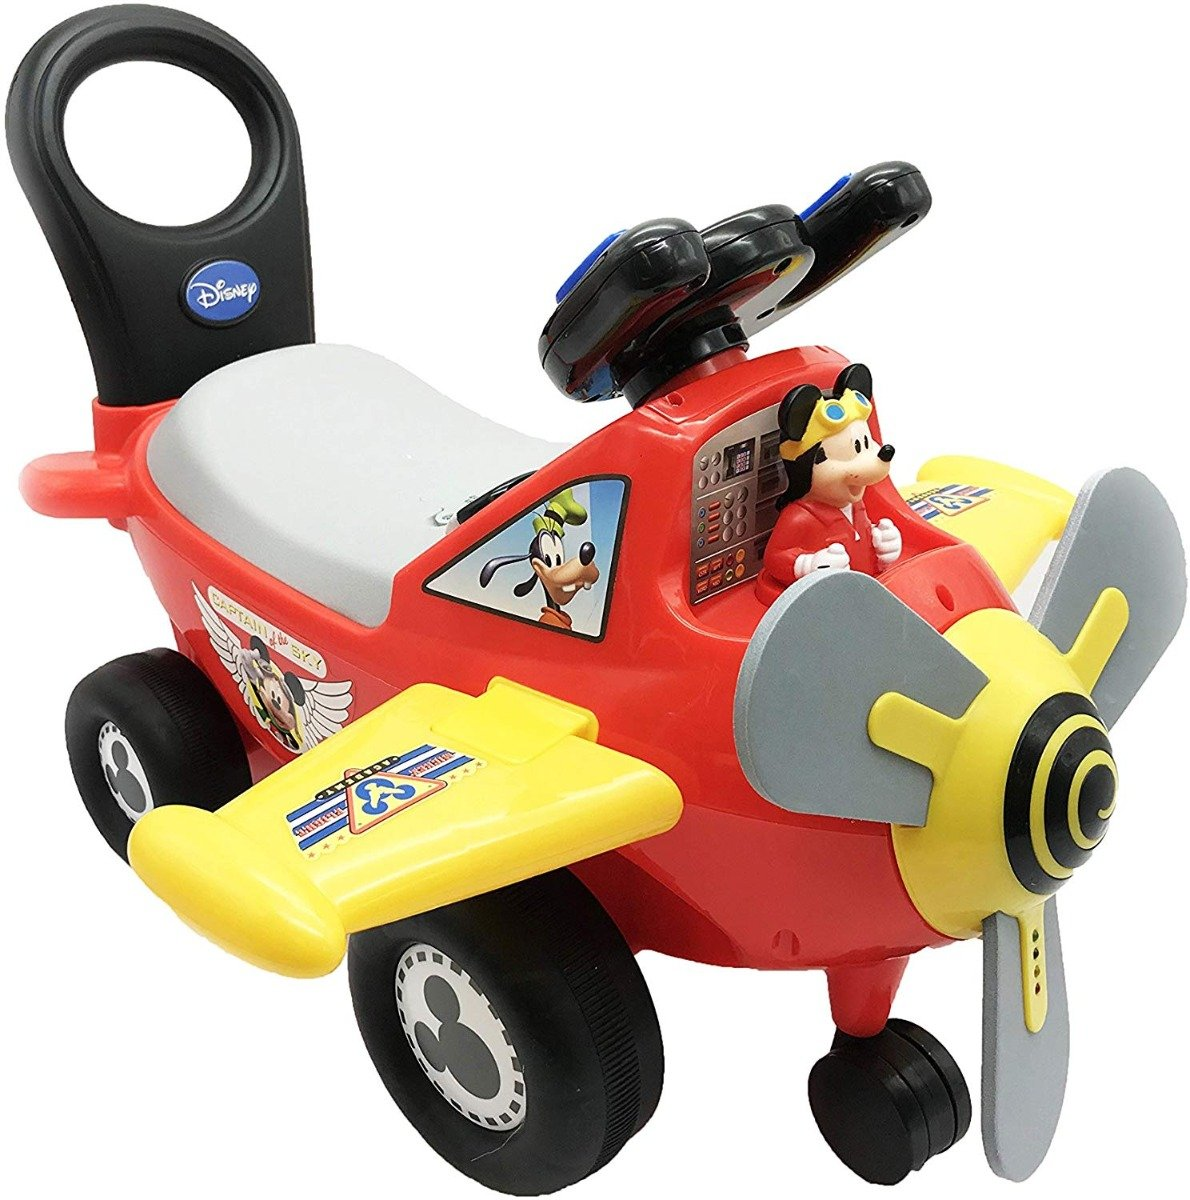 Masinuta fara pedale Kiddieland - Primul meu avion Mickey Mouse imagine